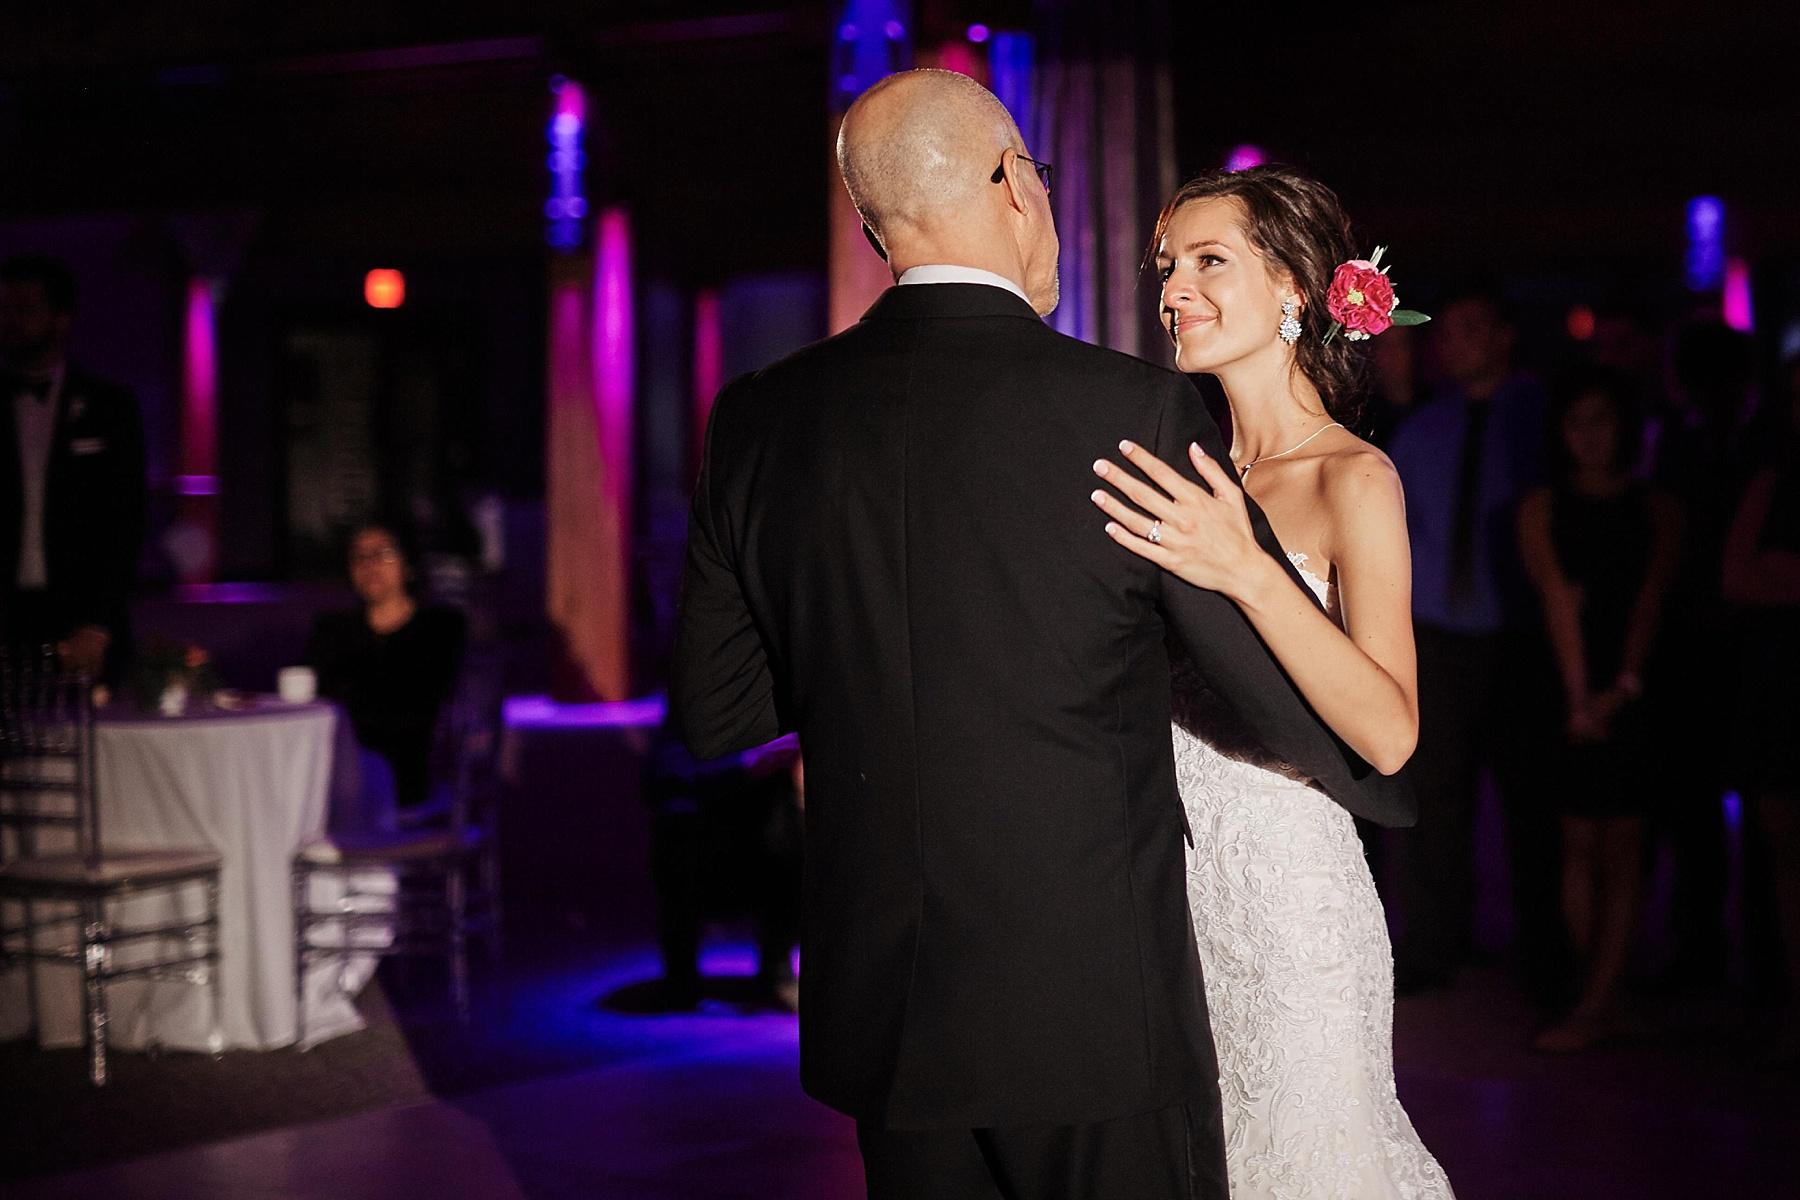 ABULAE-Wedding-Saint-paul-MN-Josh-Sofia-Wedding-Mears-Park_0847.jpg